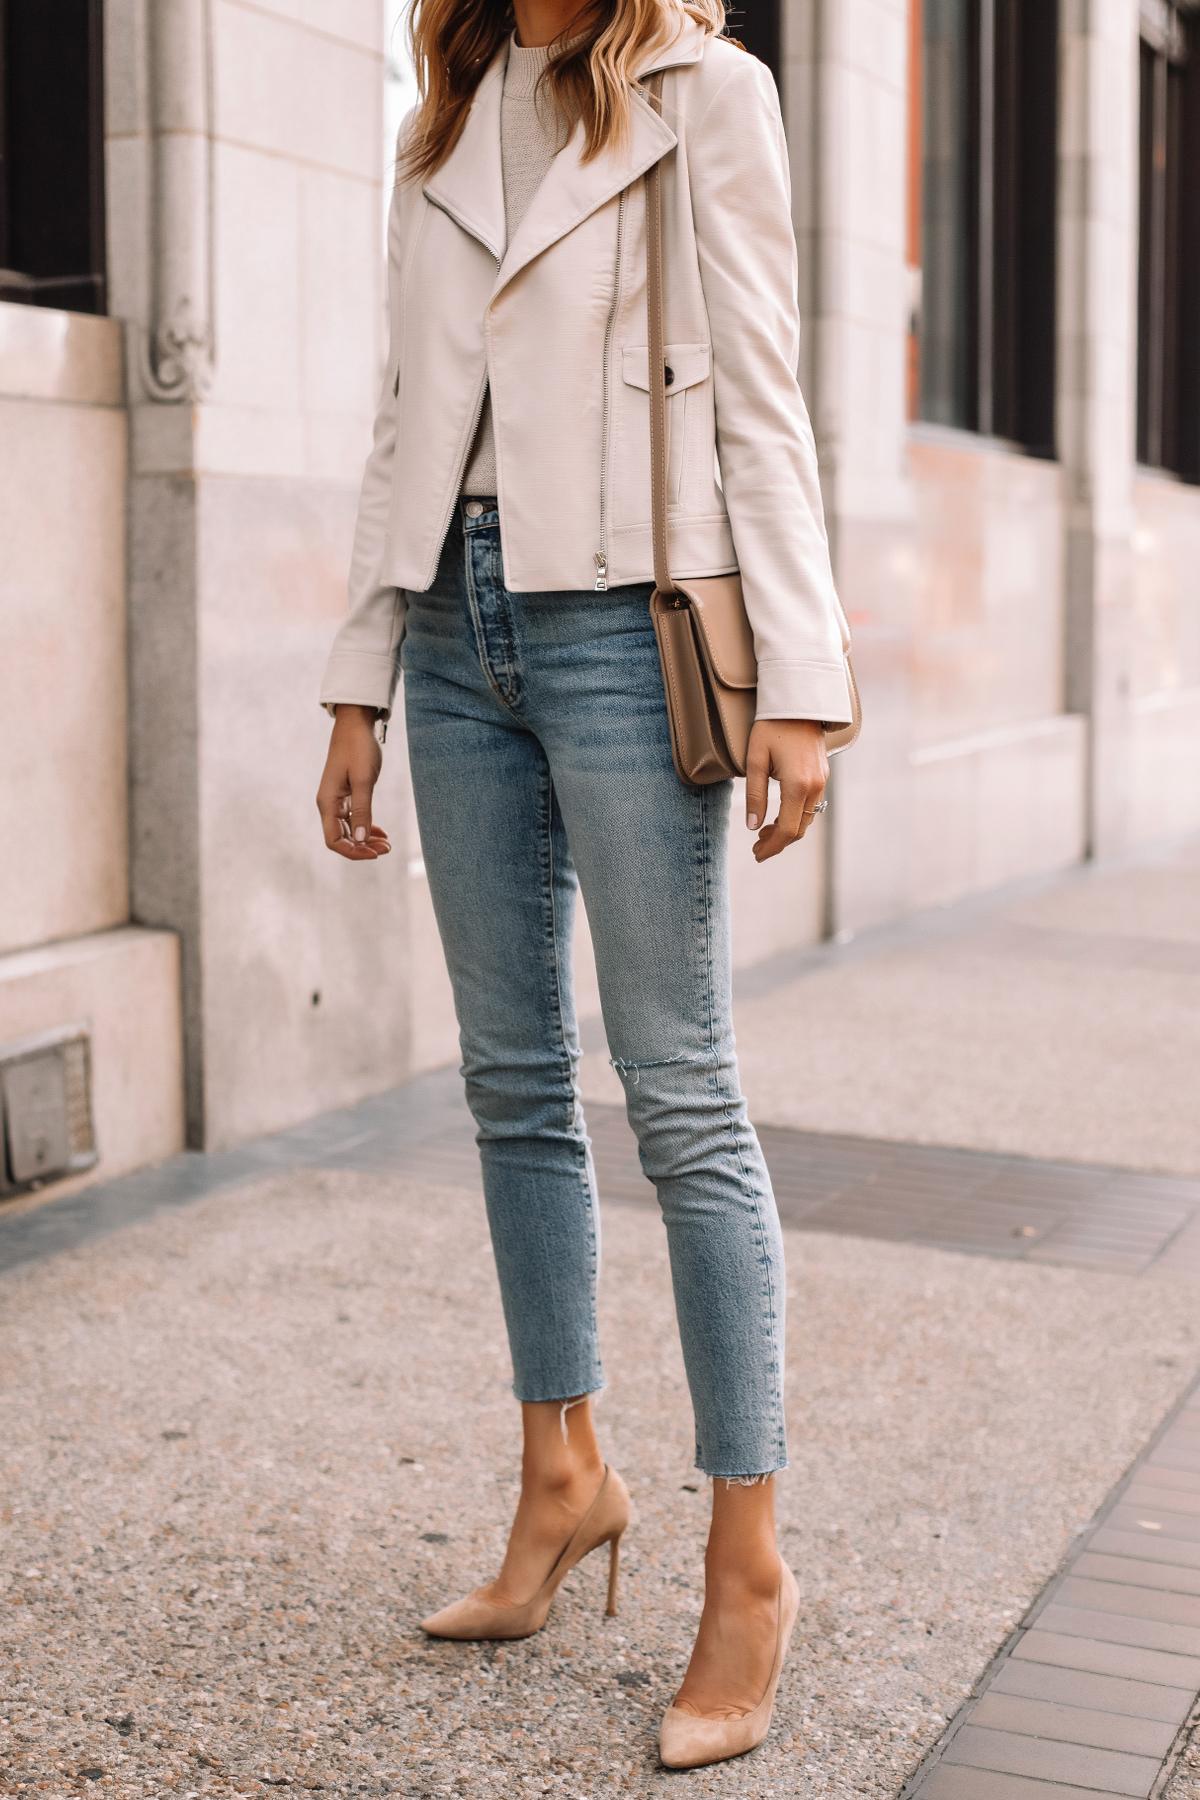 Fashion Jackson Wearing Beige Moto Jacket Denim Skinny Jeans Nude Pumps